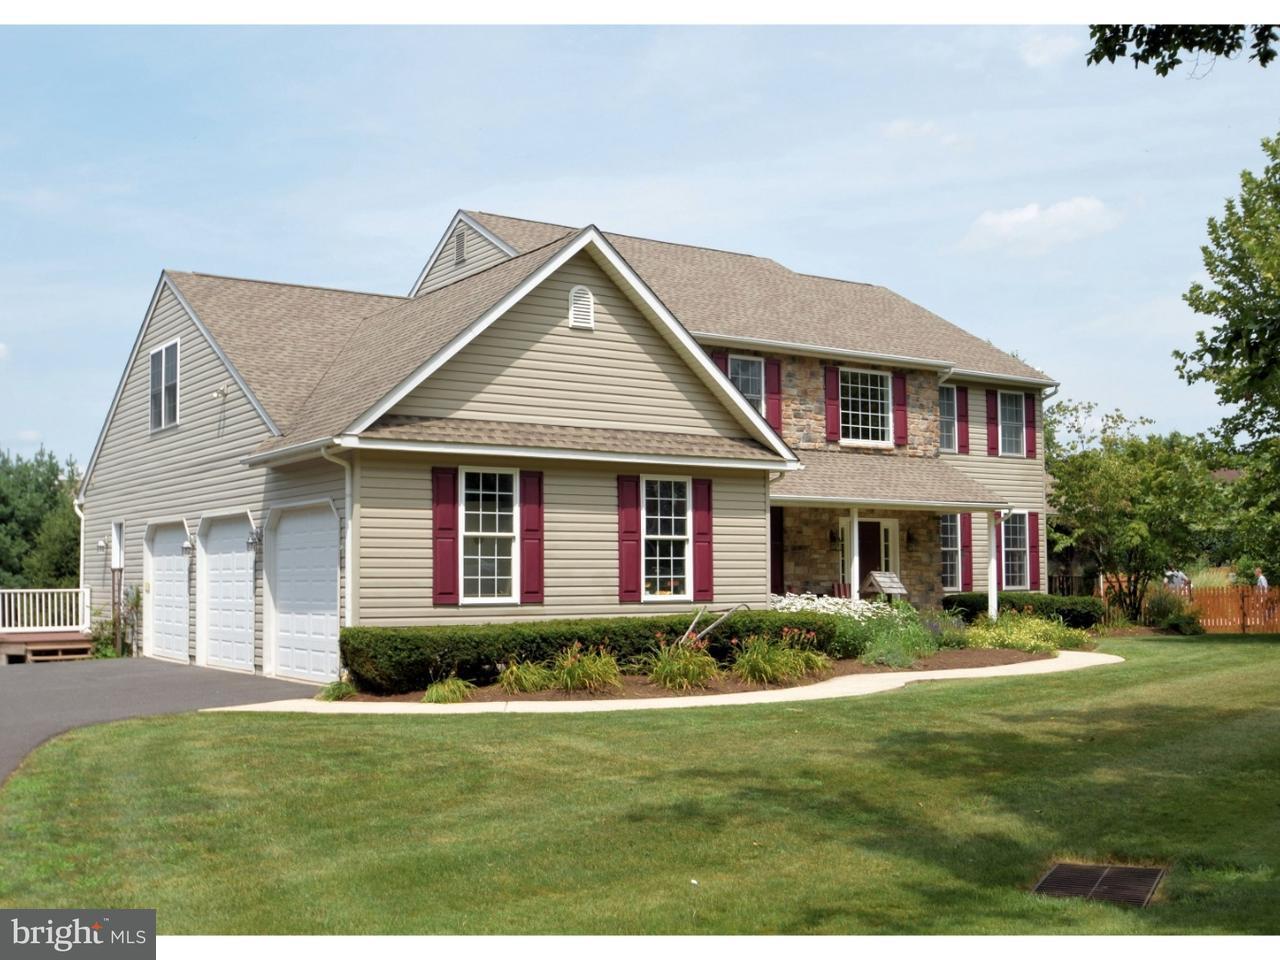 Villa per Vendita alle ore 231 HARLEYSVILLE PIKE Telford, Pensilvania 18964 Stati Uniti